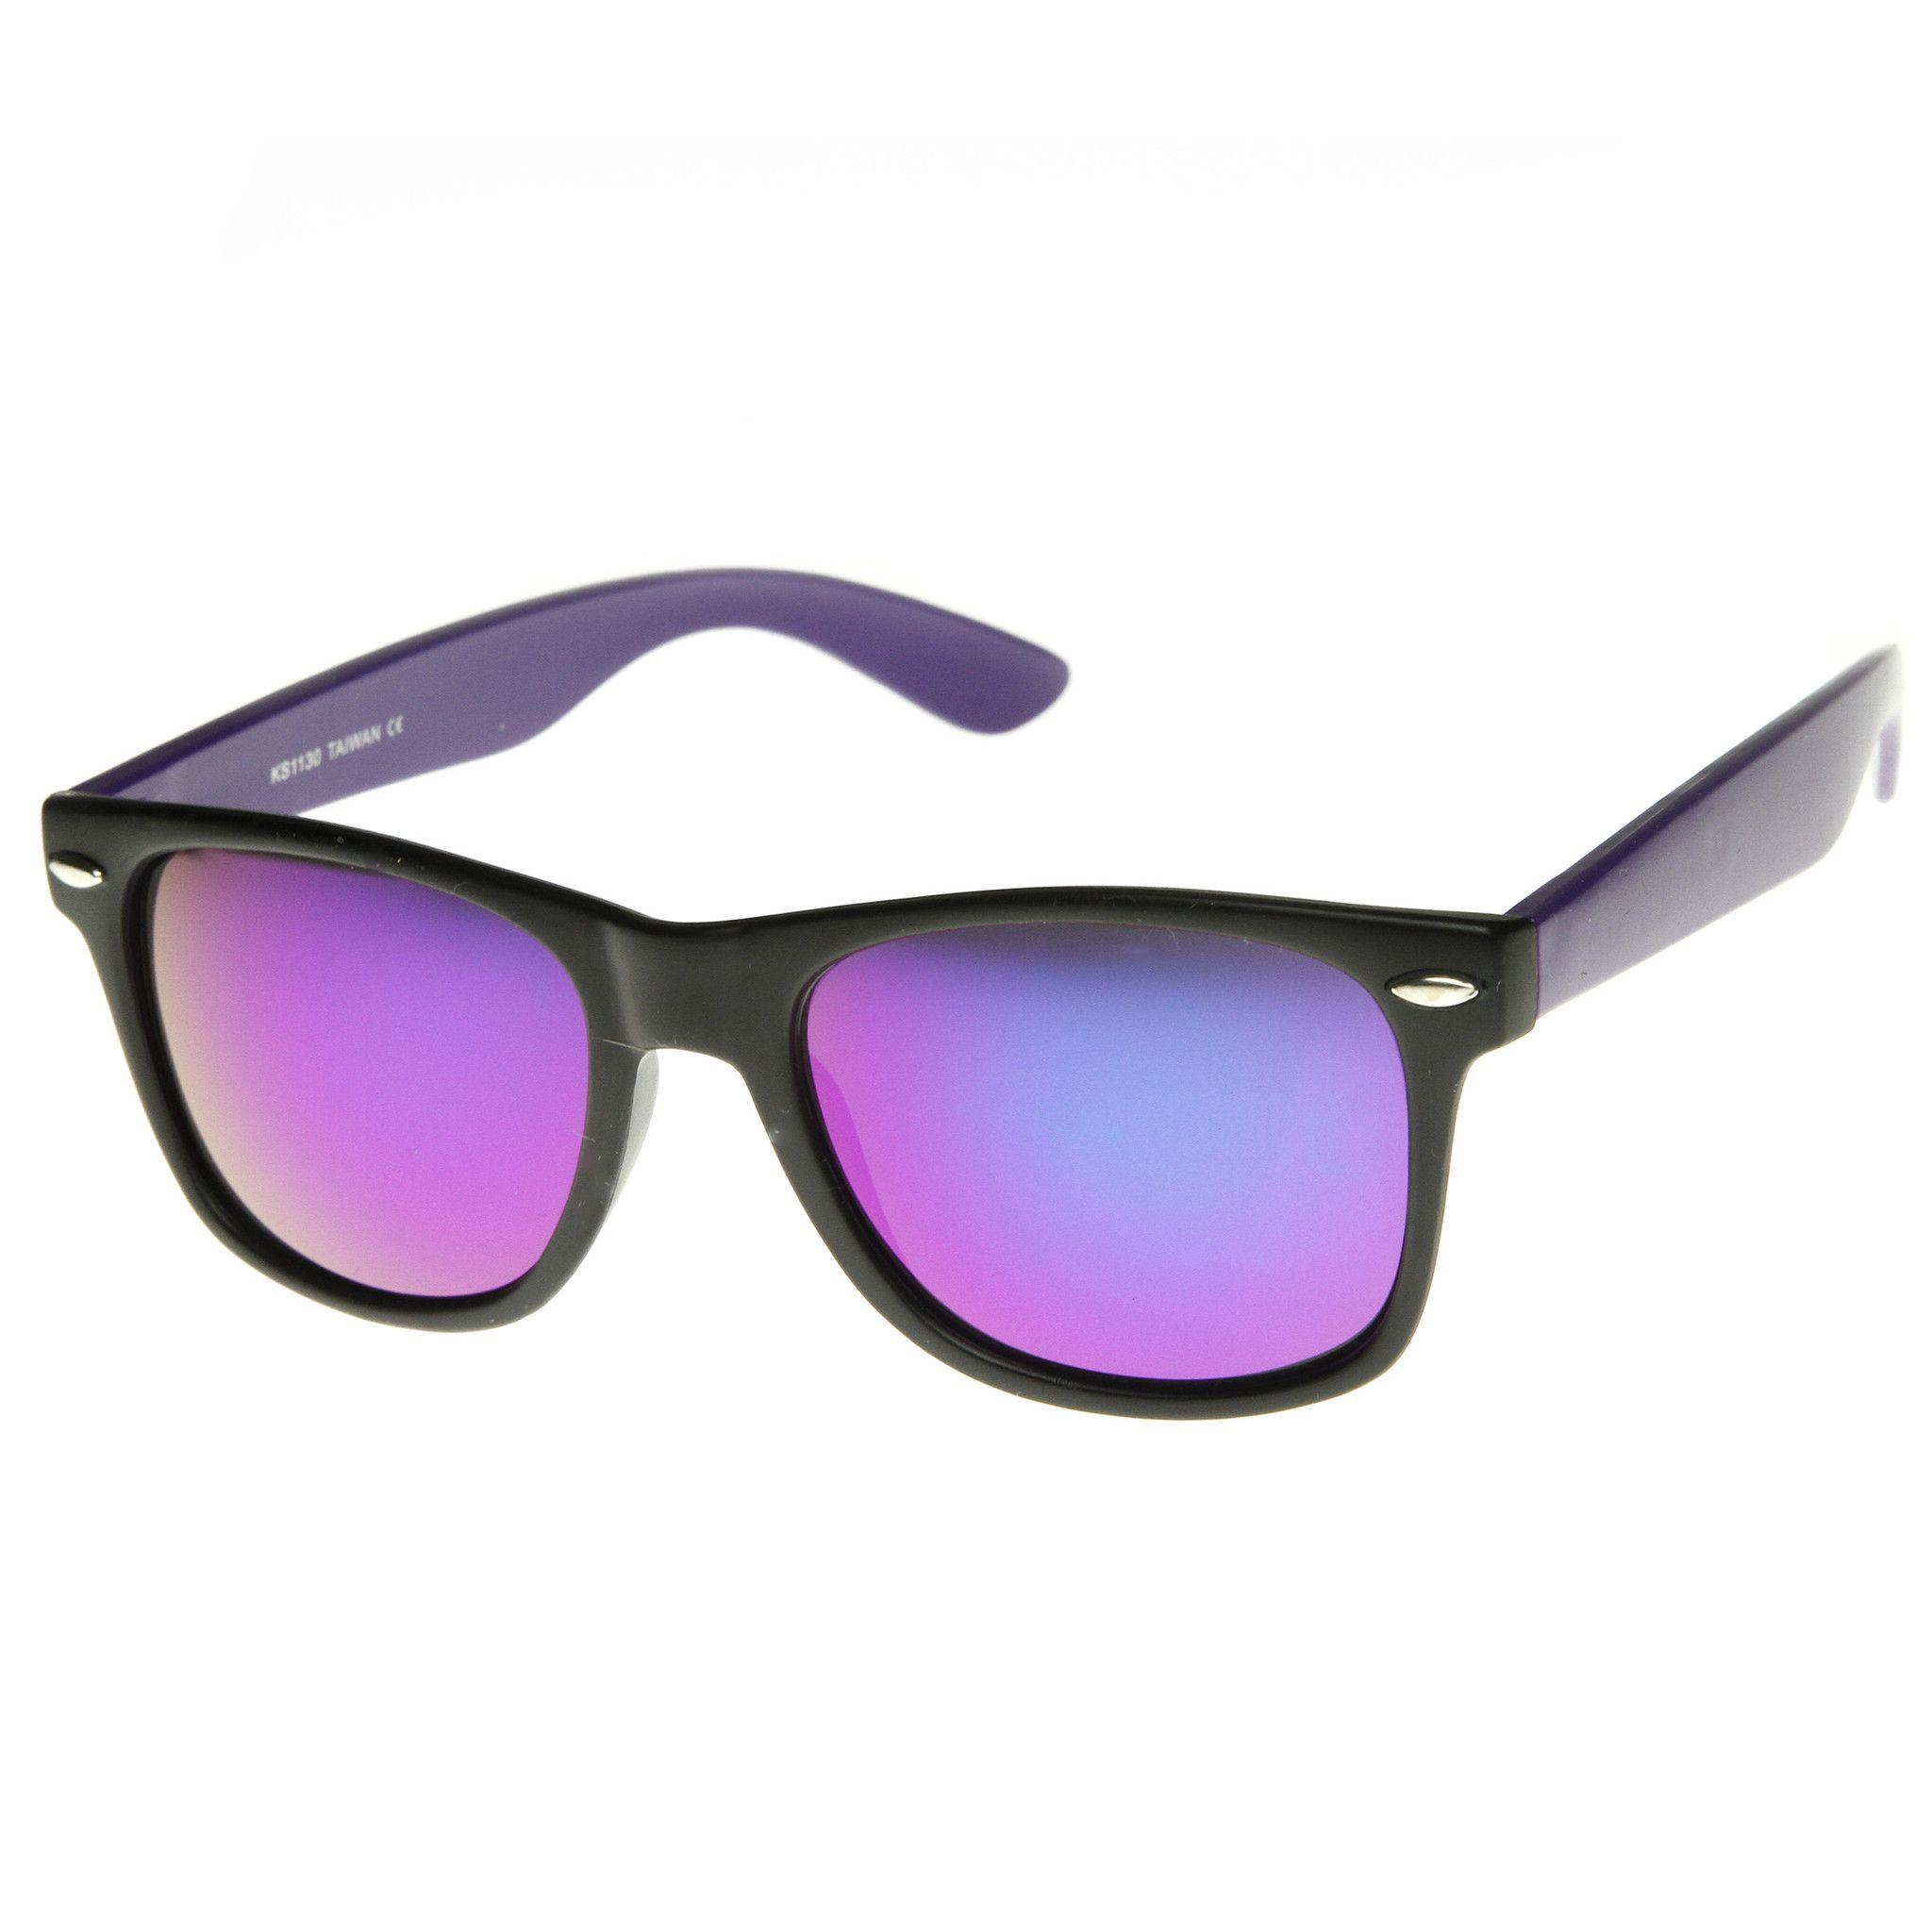 948442de18 Retro 1980 s Horned Rim Two-Tone Neon Revo Mirror Lens Sunglasses 8911